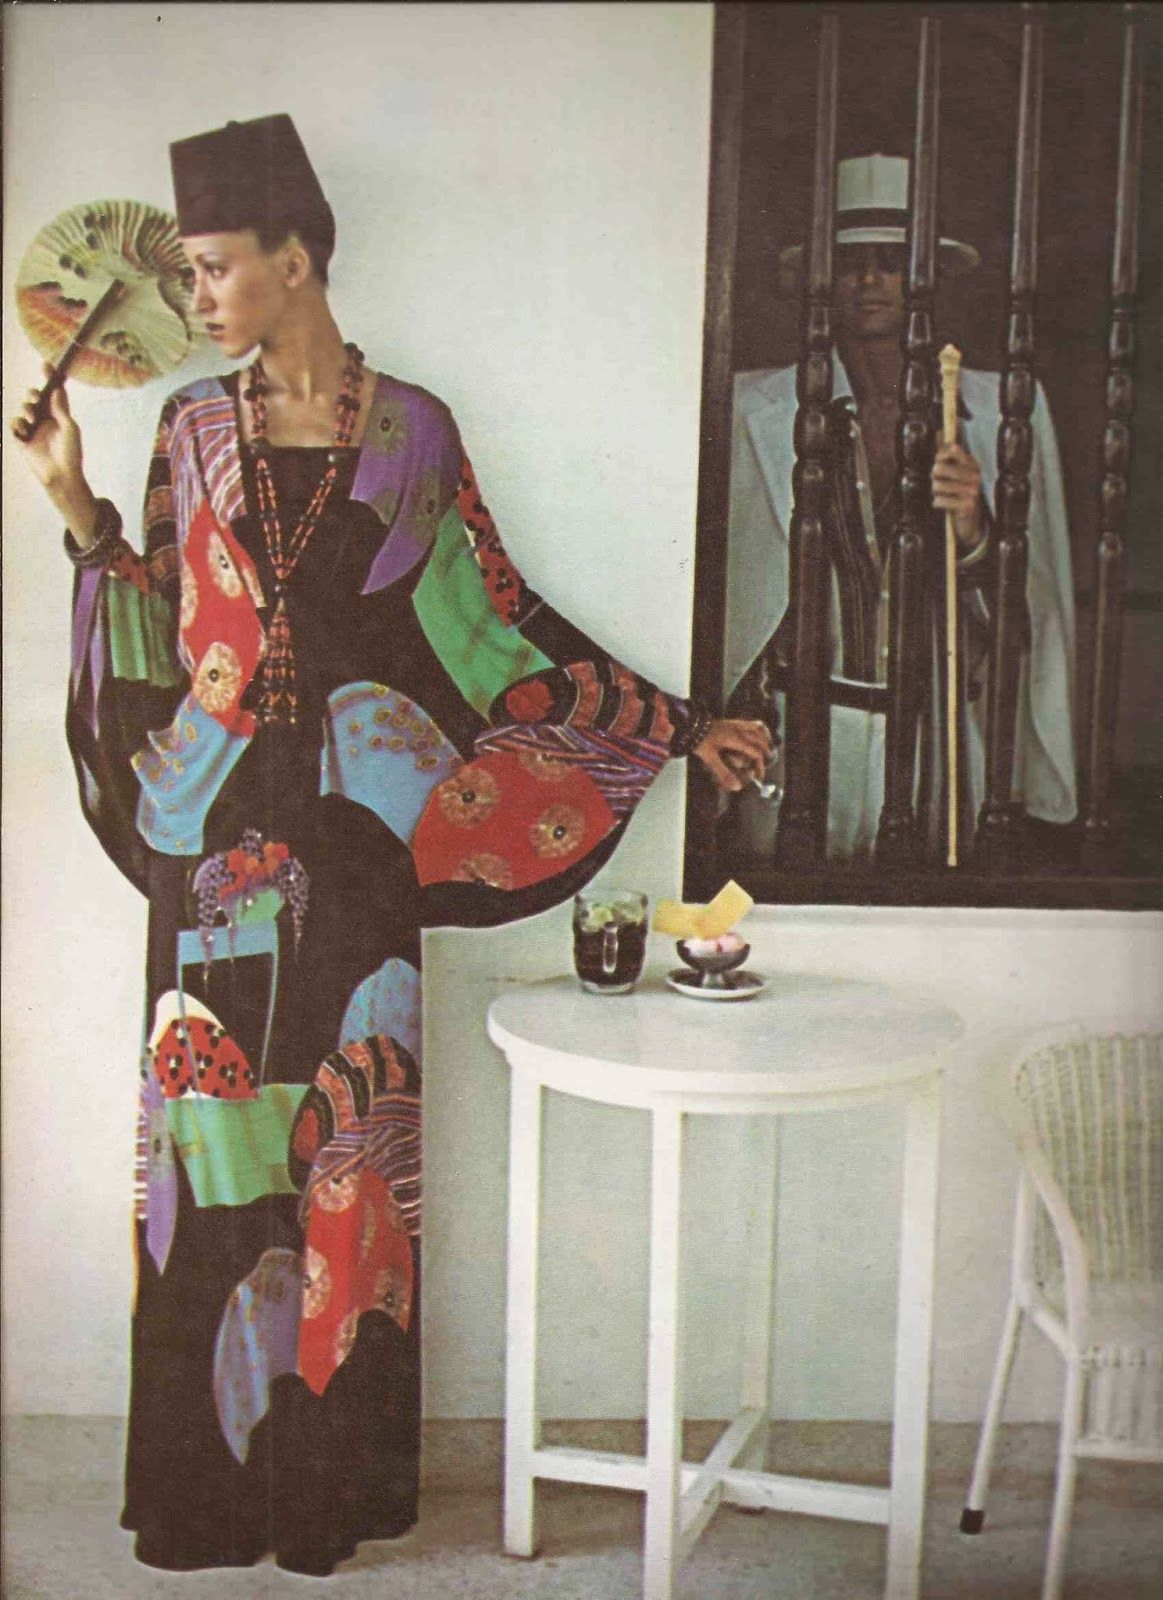 Devodotcom barry mckinley us pinterest magazines vintage